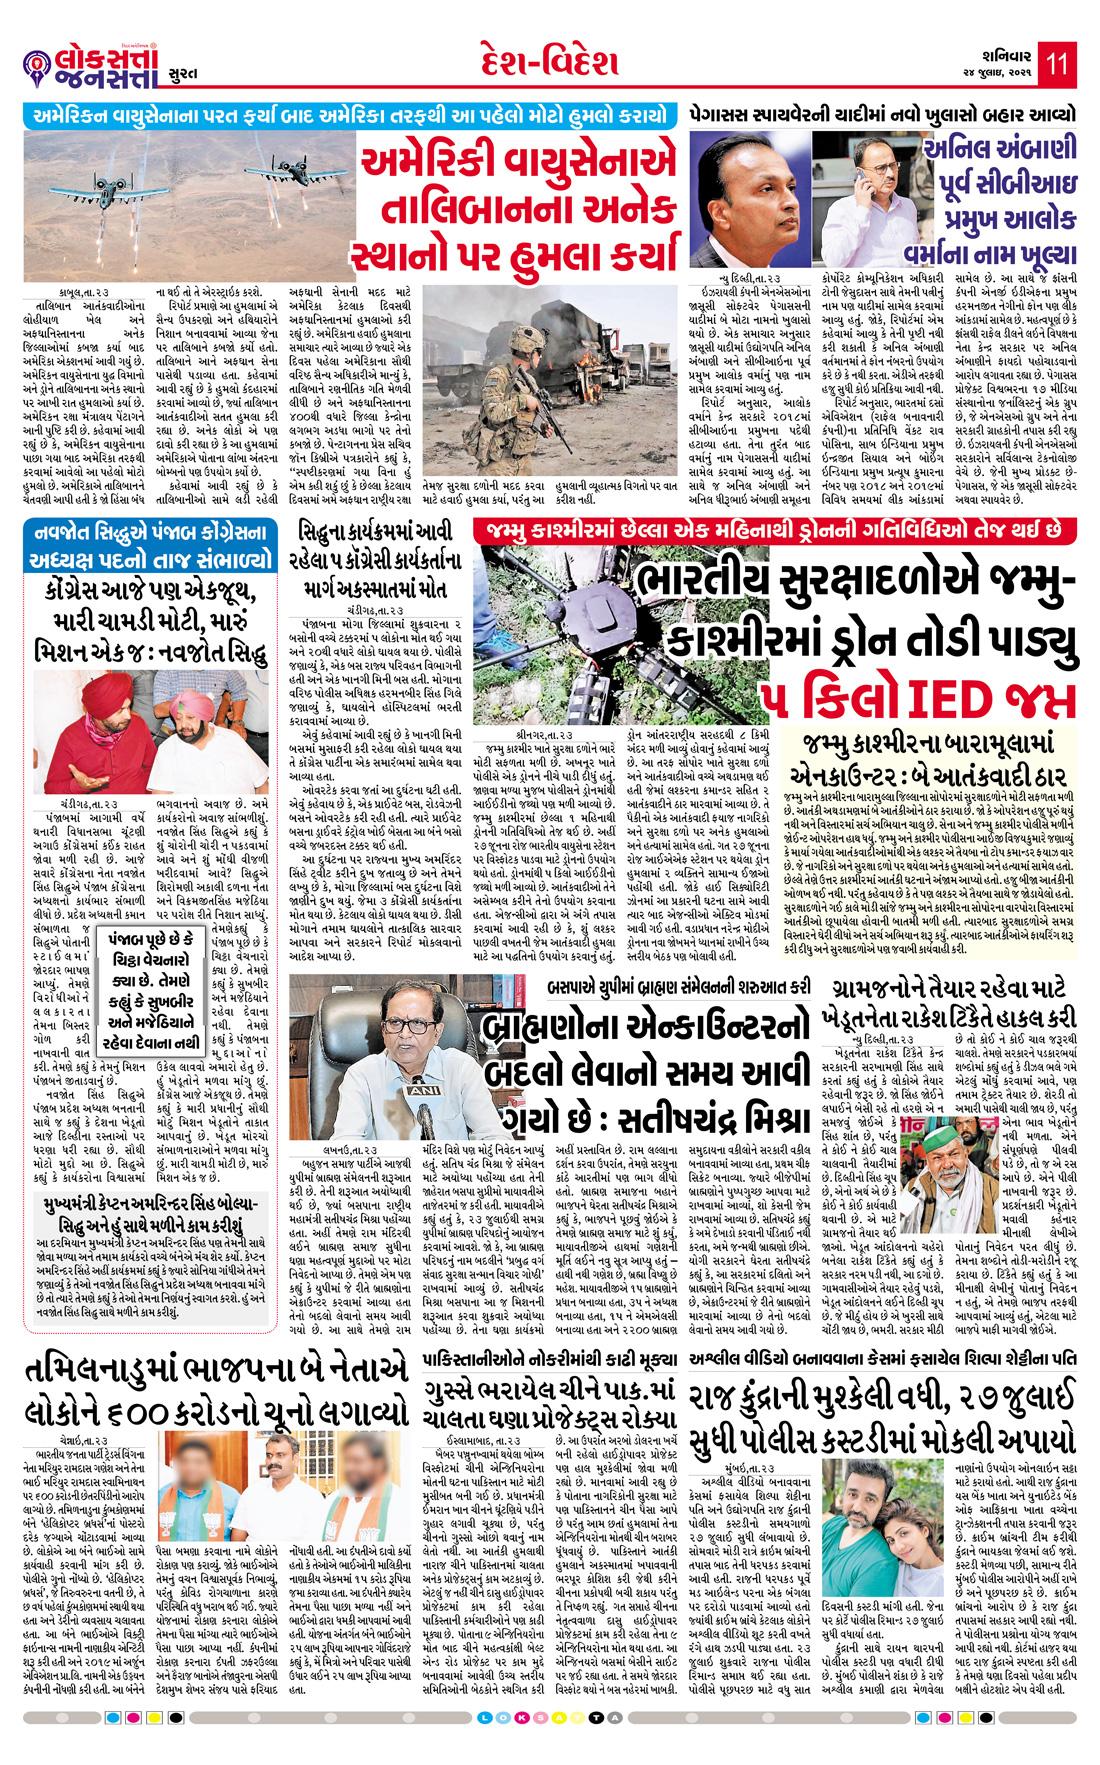 Loksatta Jansatta News Papaer E-paper dated 2021-07-24 | Page 11